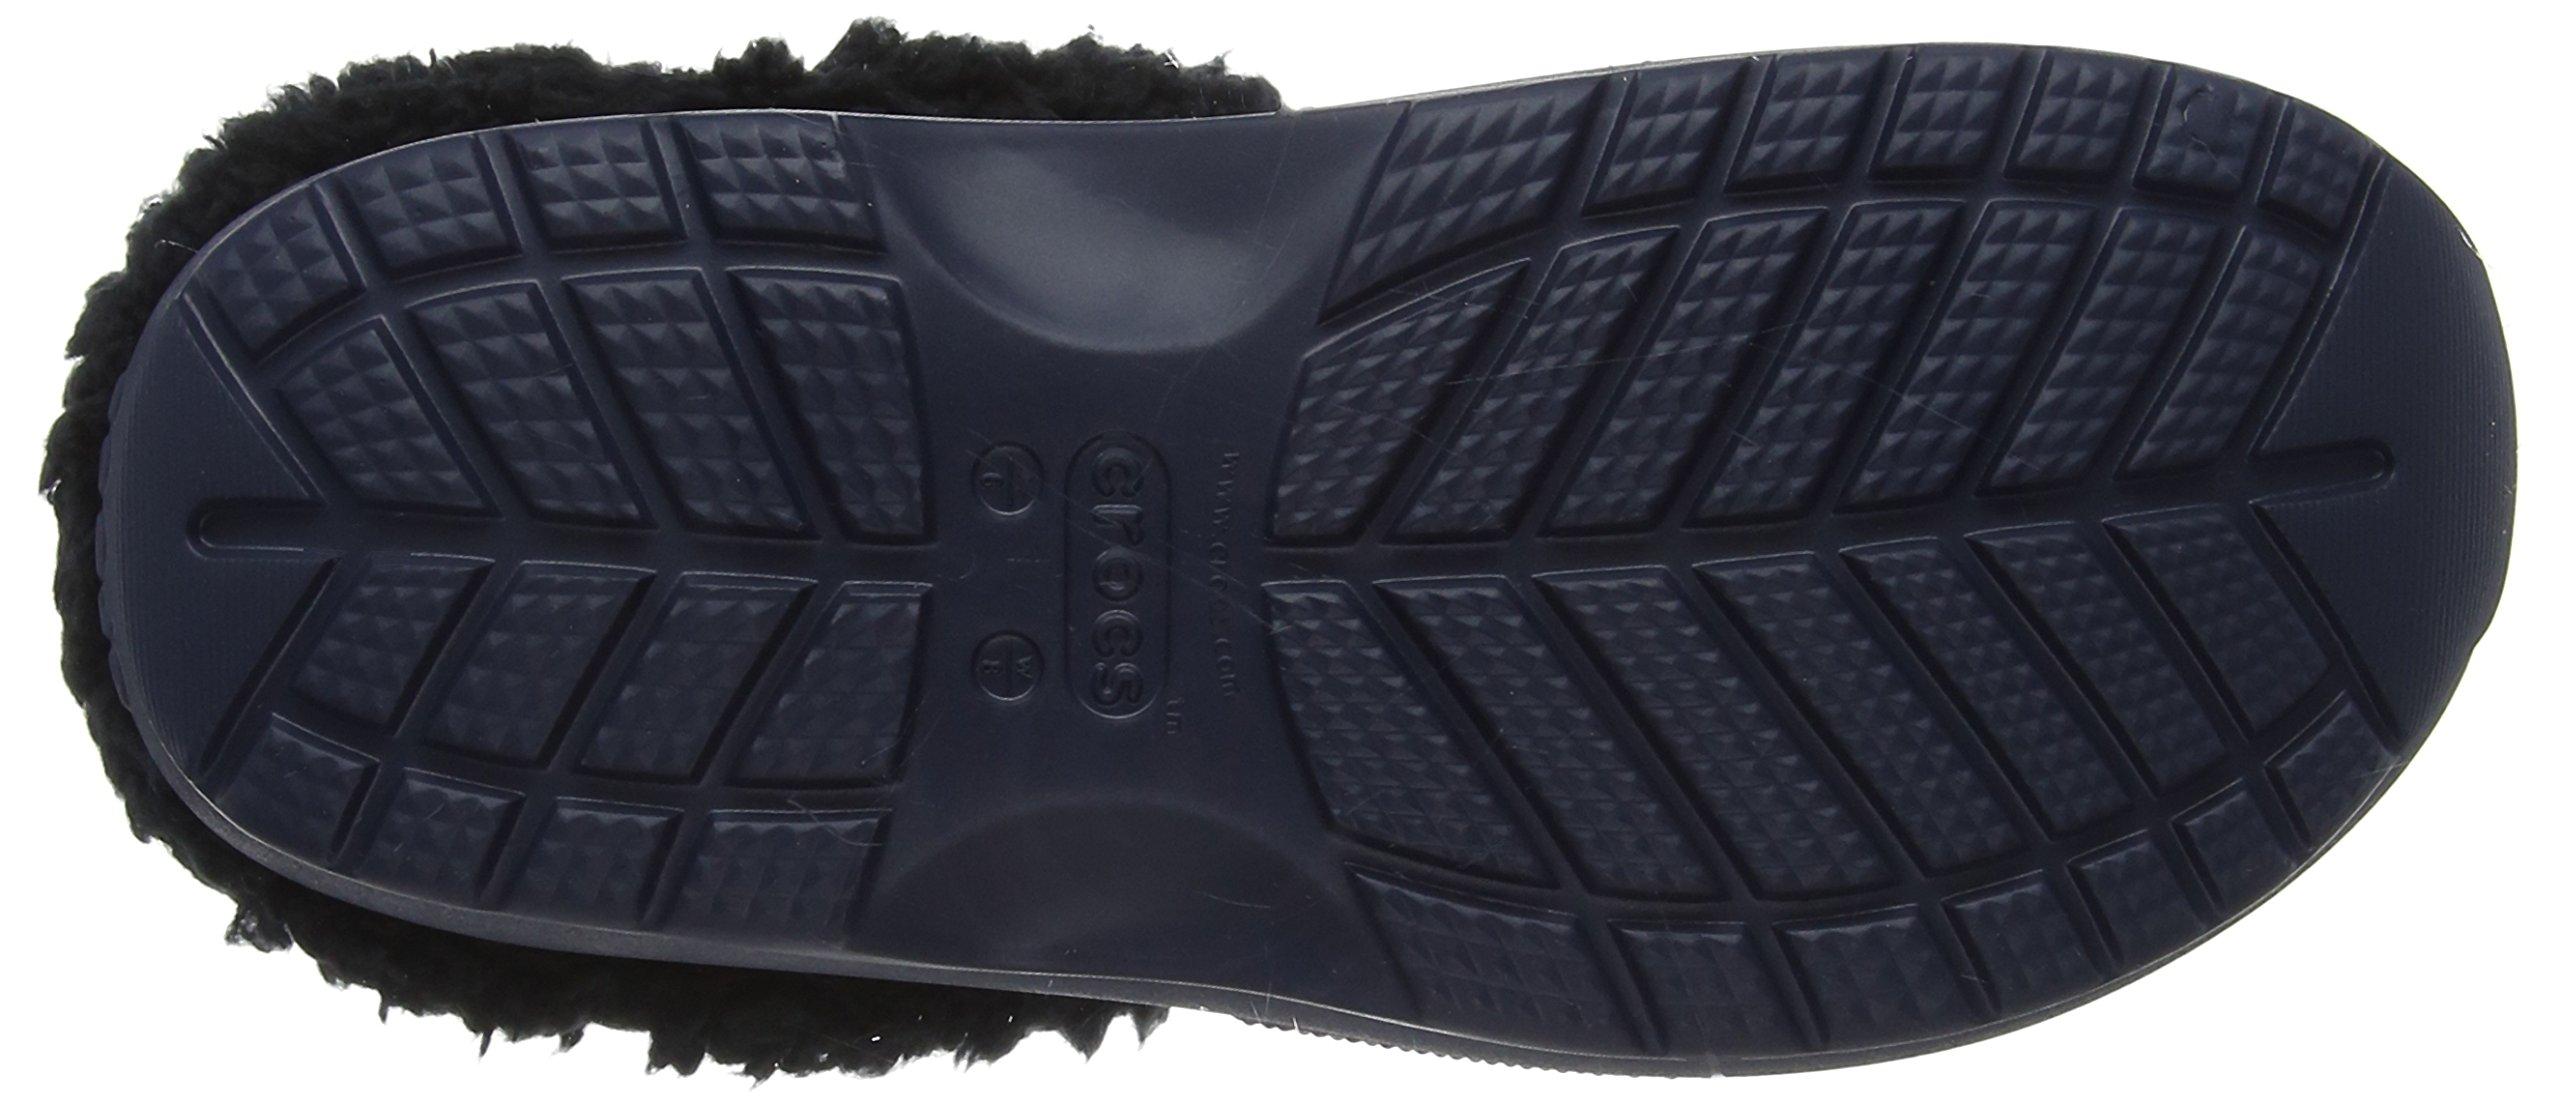 Crocs Classic Blitzen III Graphic, Zuecos Unisex Adulto